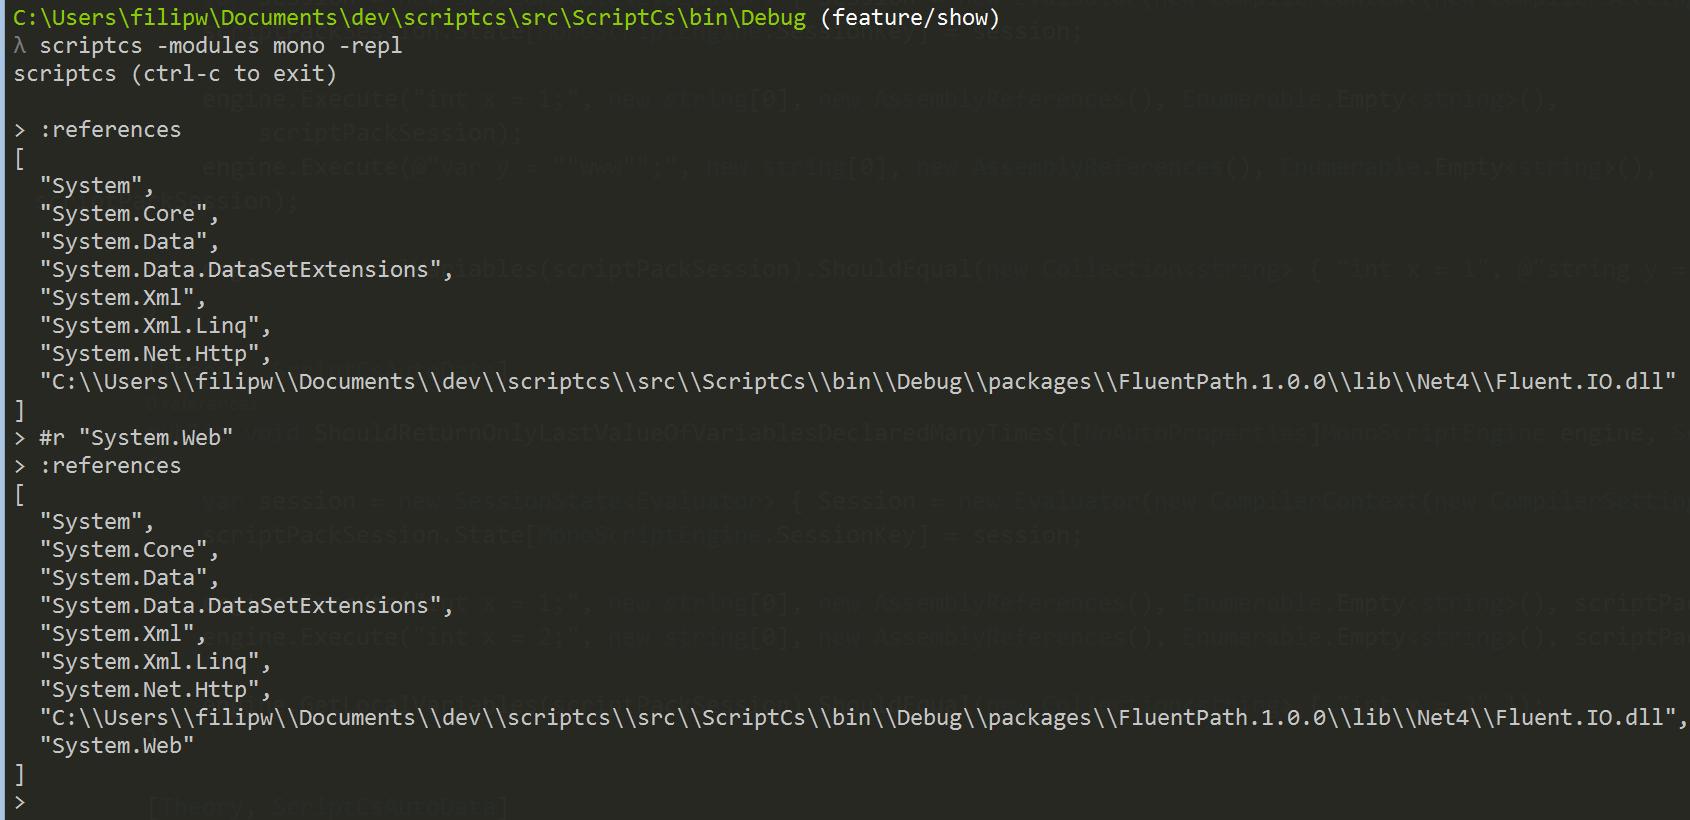 screenshot 2014-09-09 17 34 56